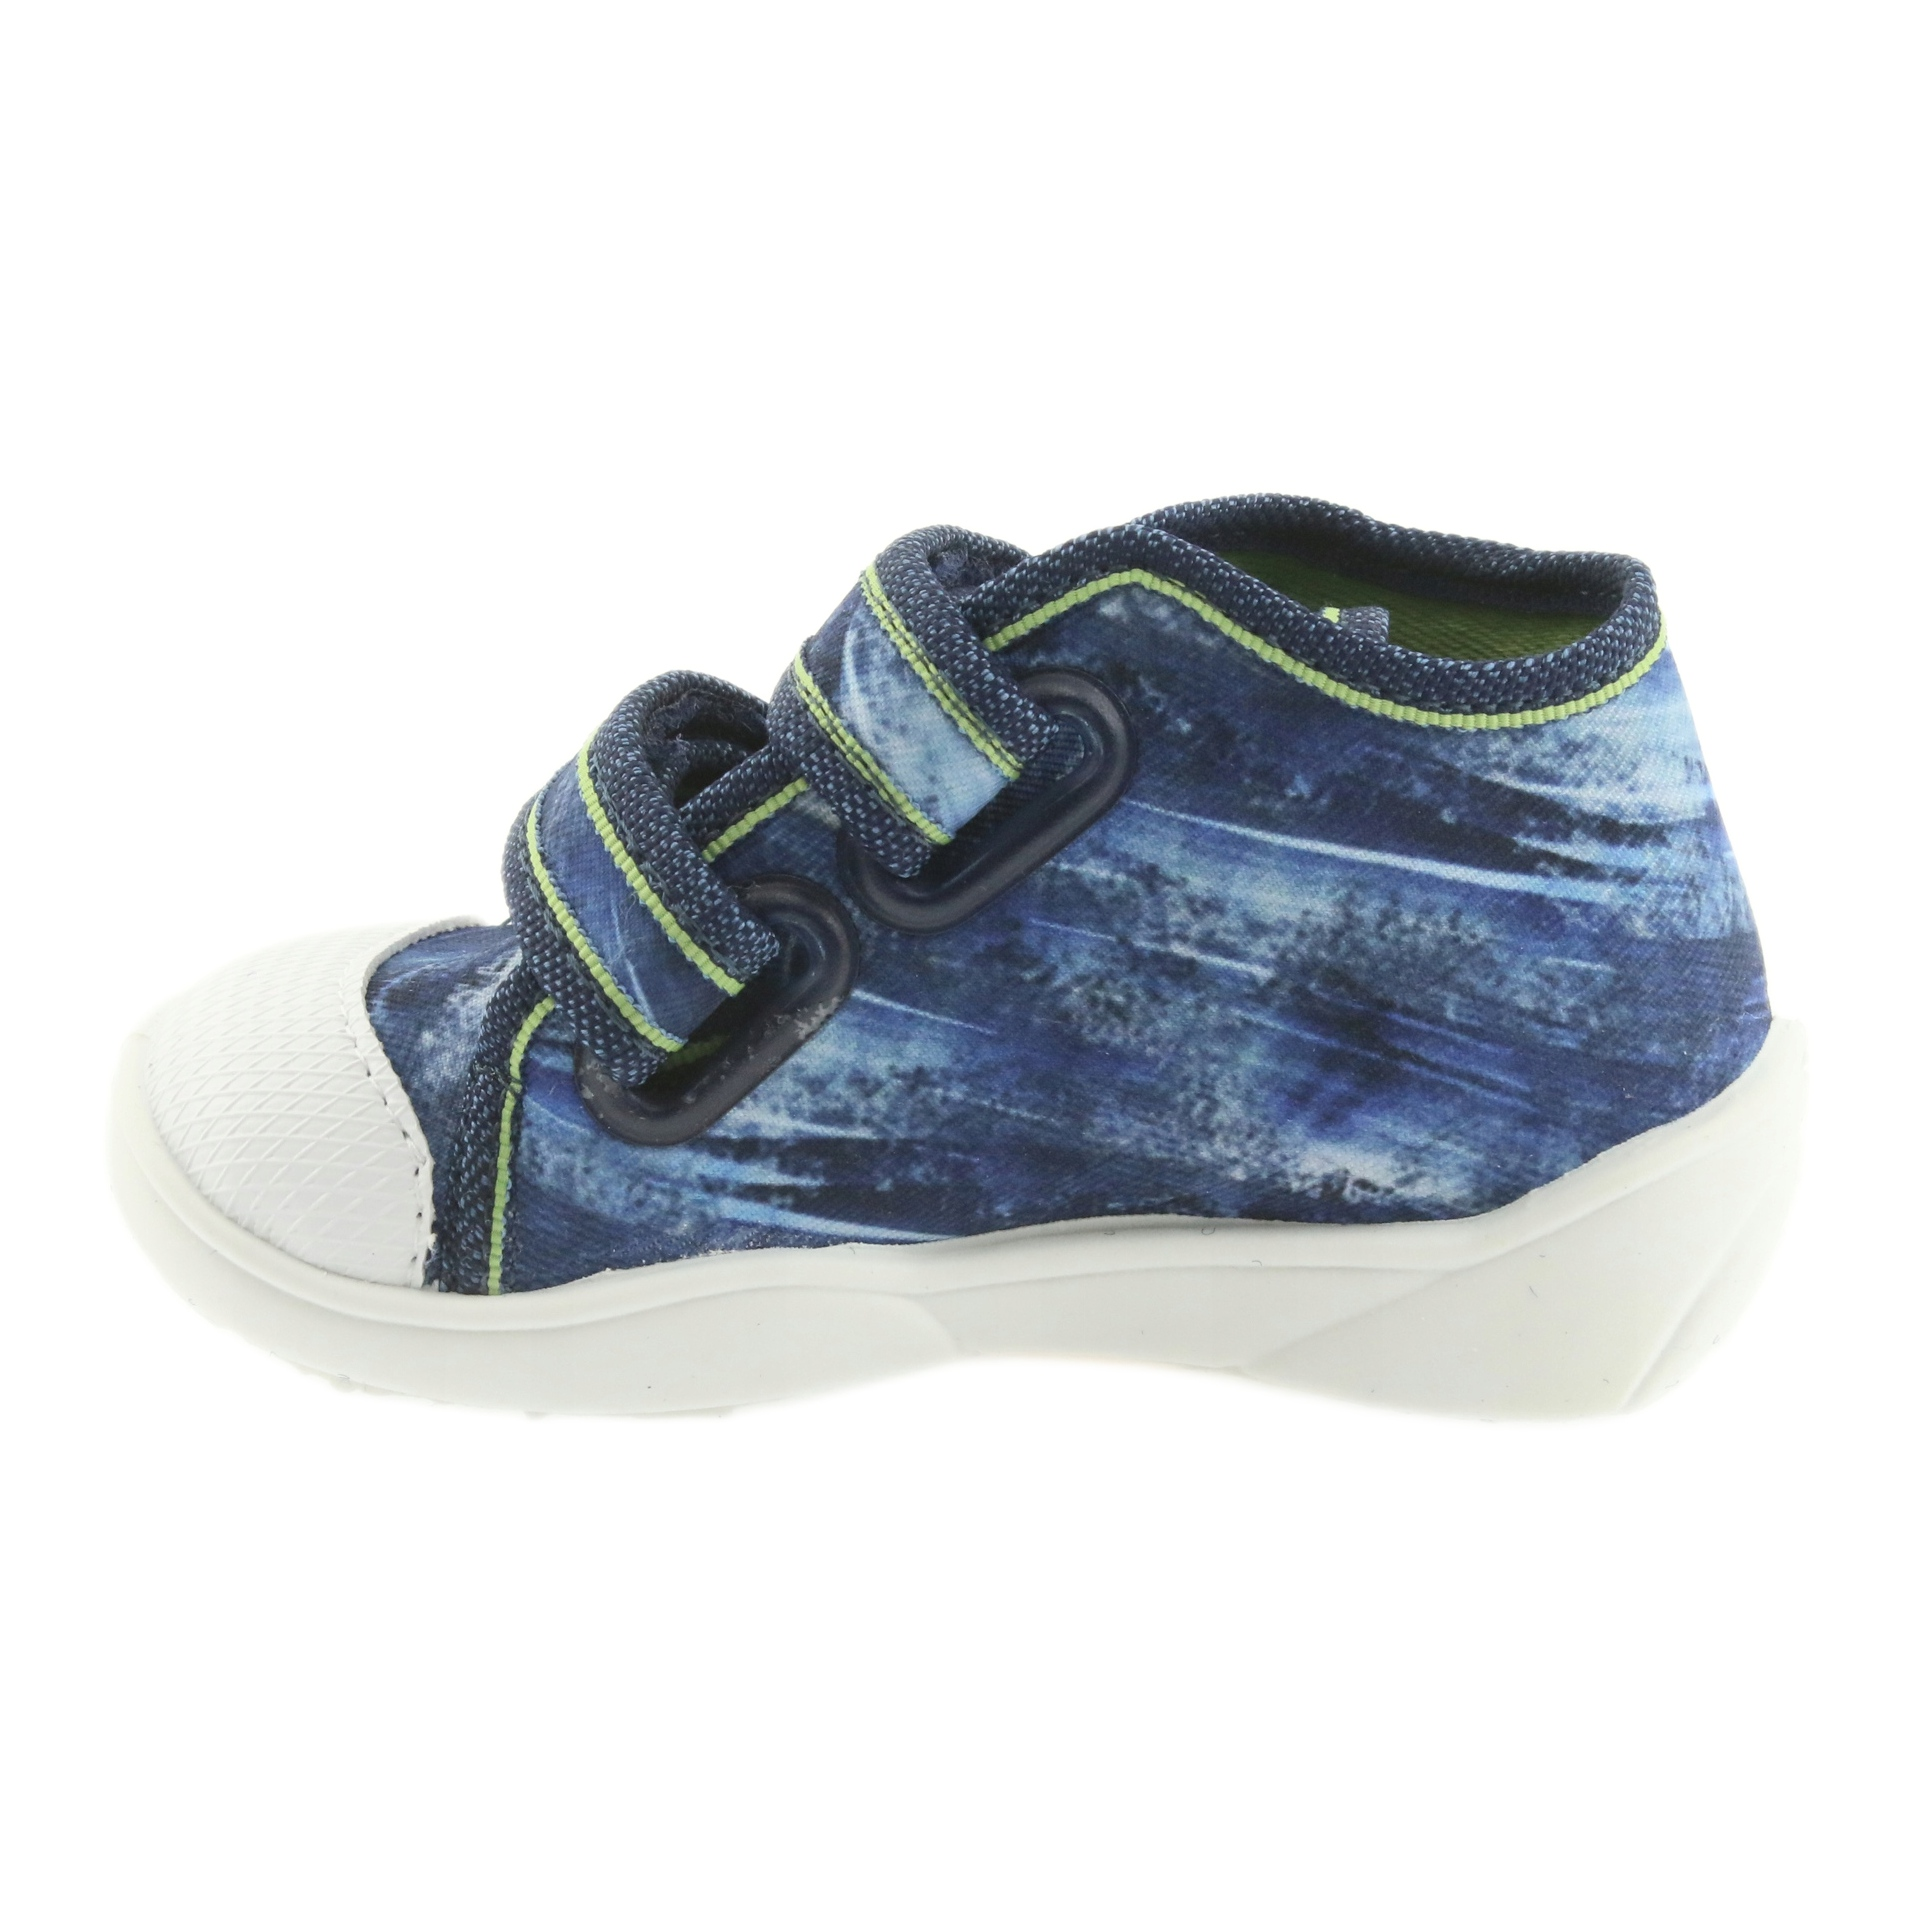 miniatura 3 - Scarpe da calcio per bambini Befado 212P058 blu verde marina